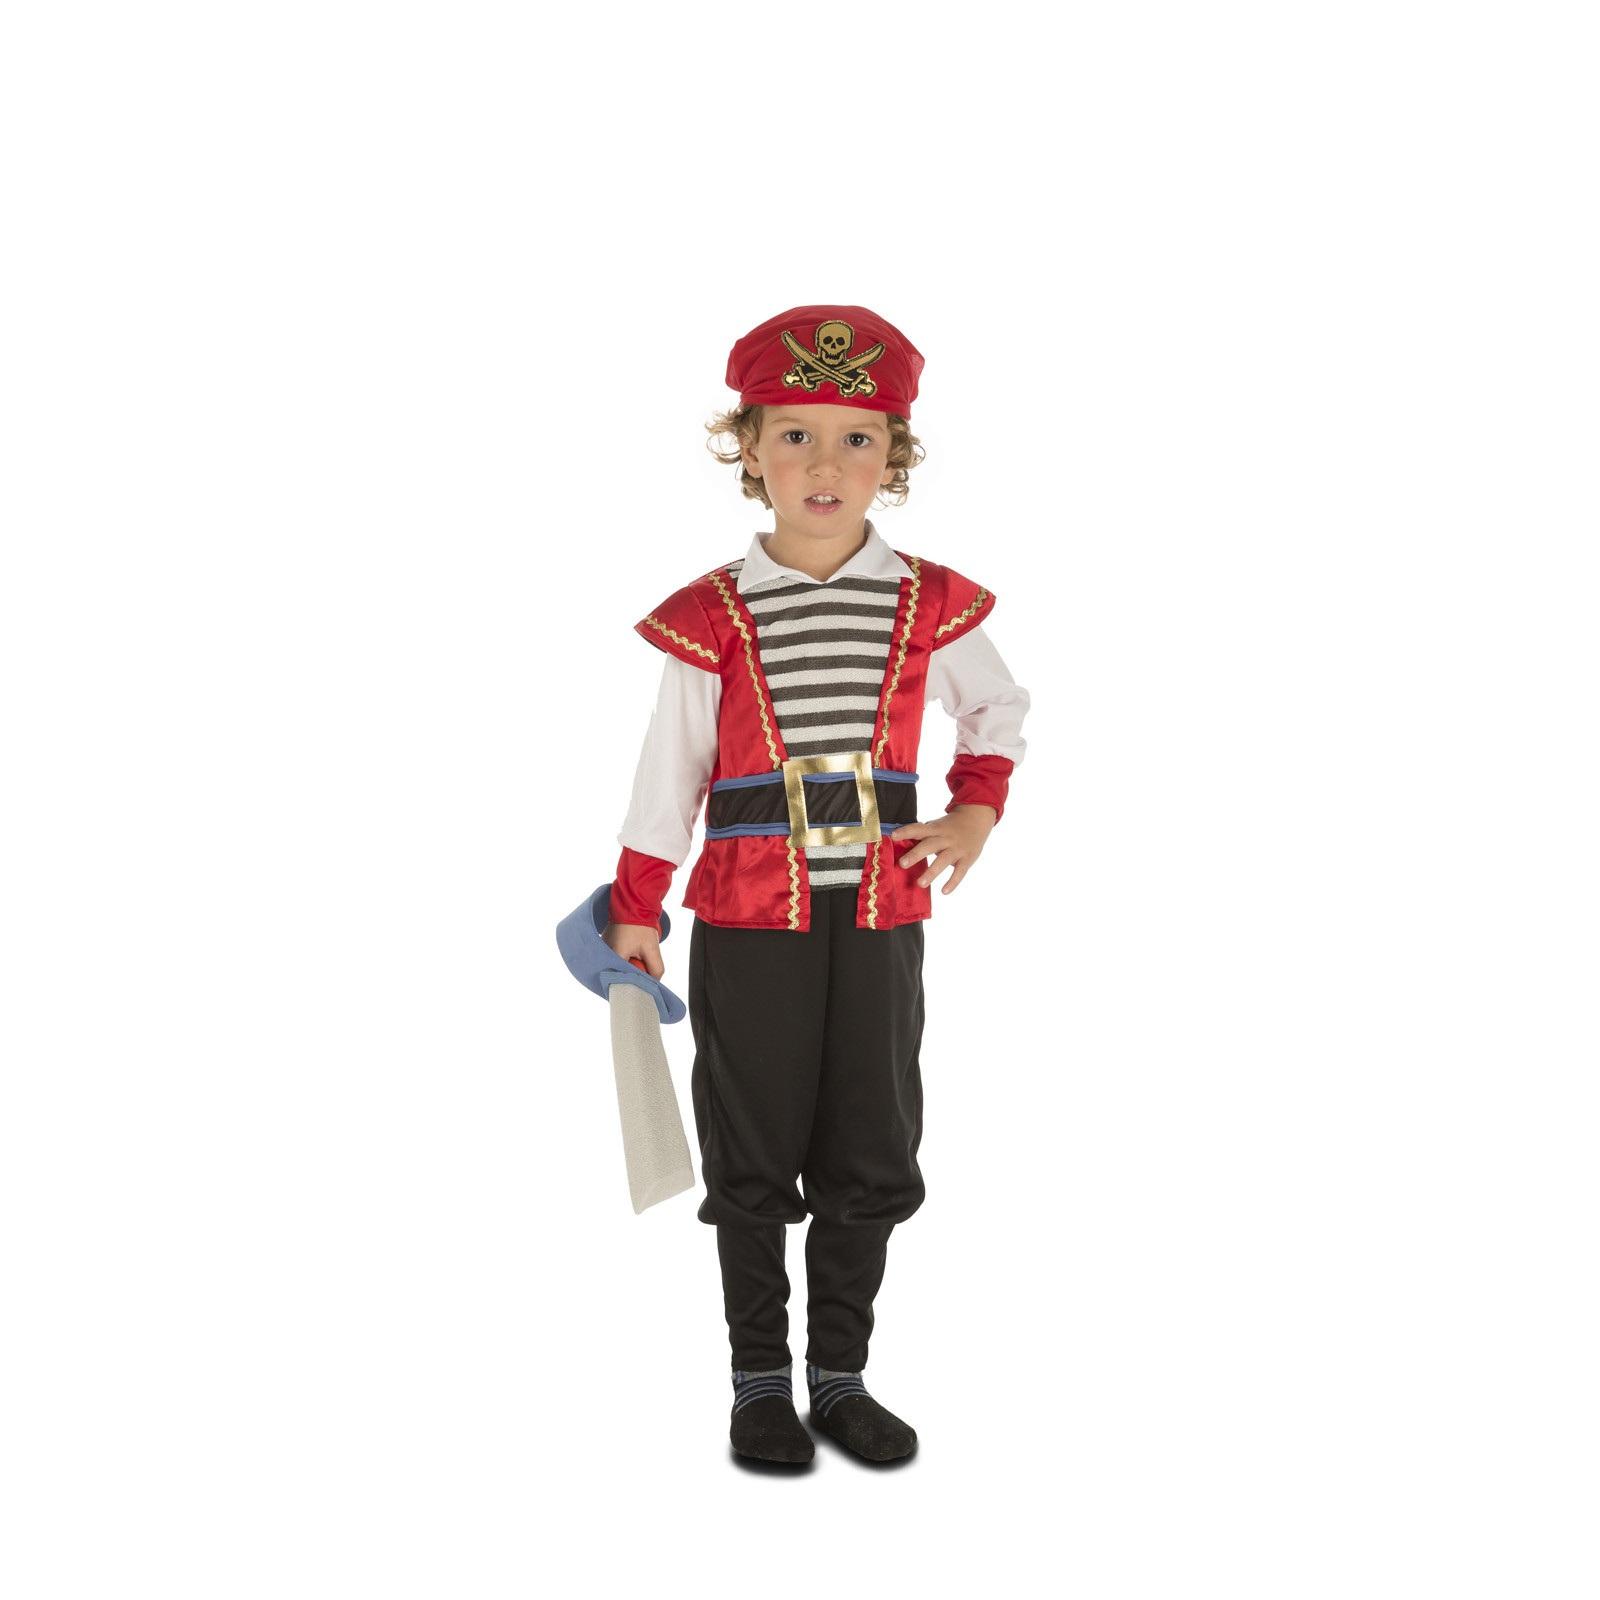 disfraz pirata rojo bebé niño 204074mom - DISFRAZ DE PIRATA ROJO BEBE